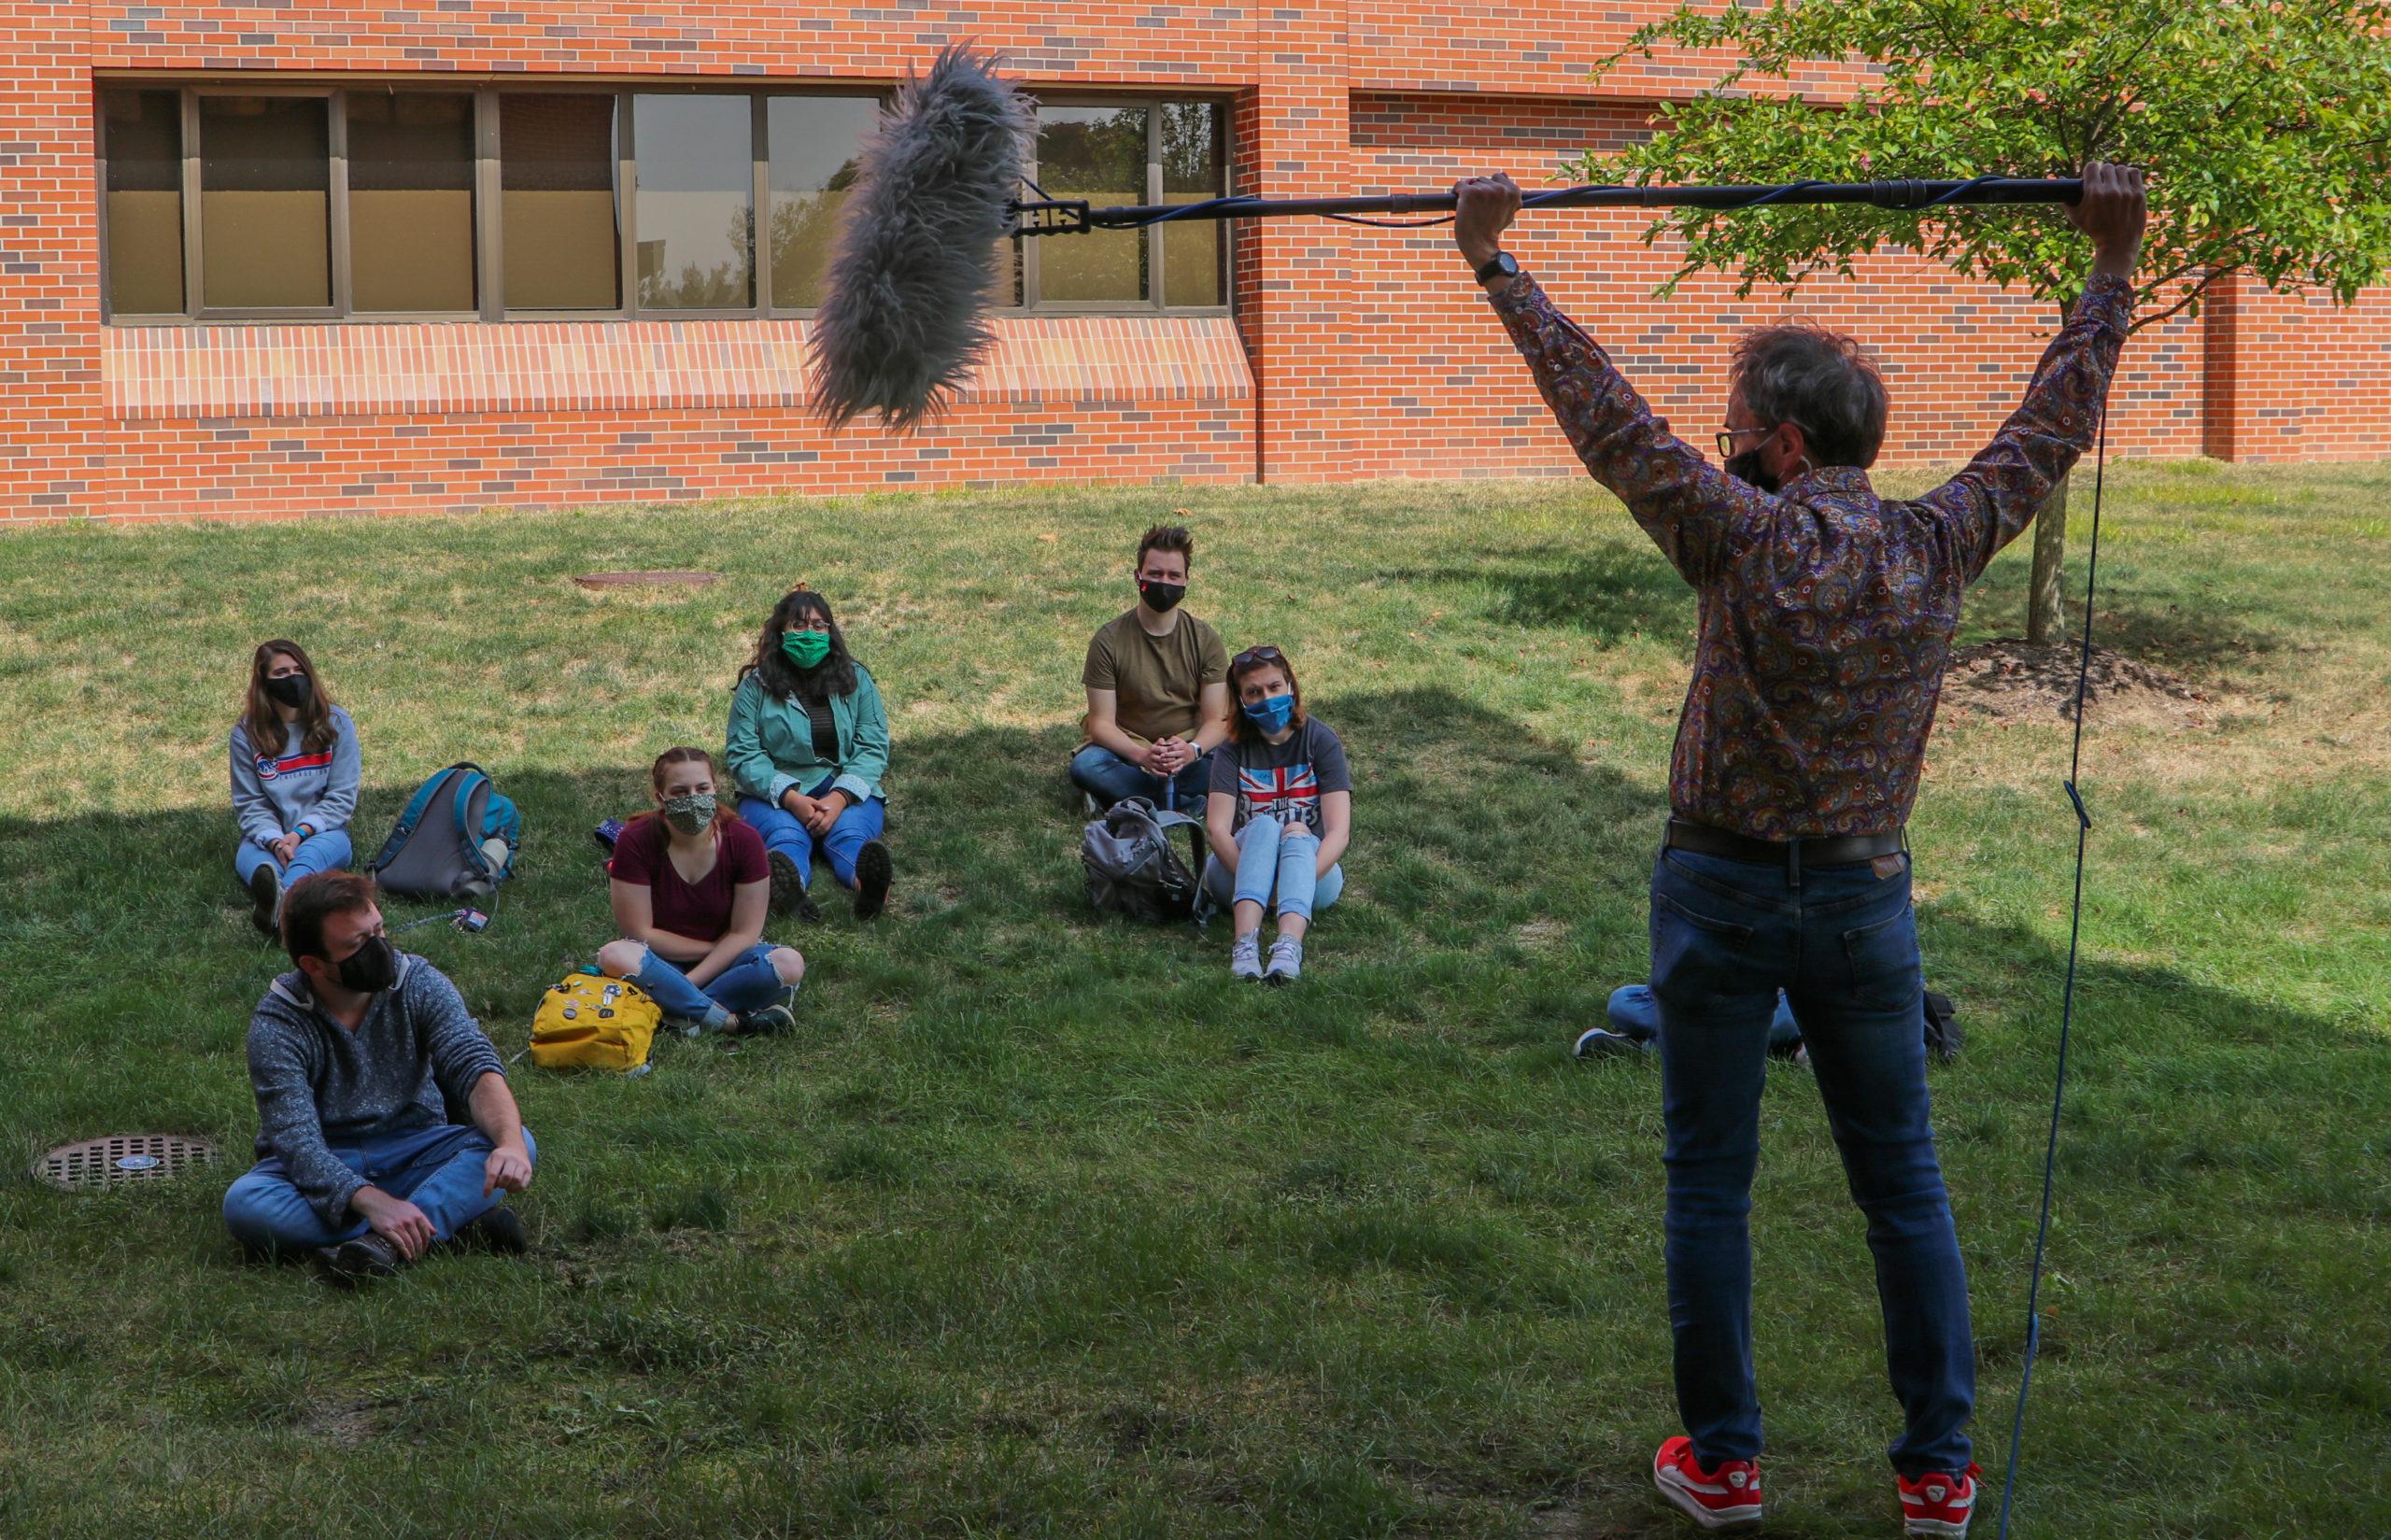 Stan teaches his audio class outdoors.